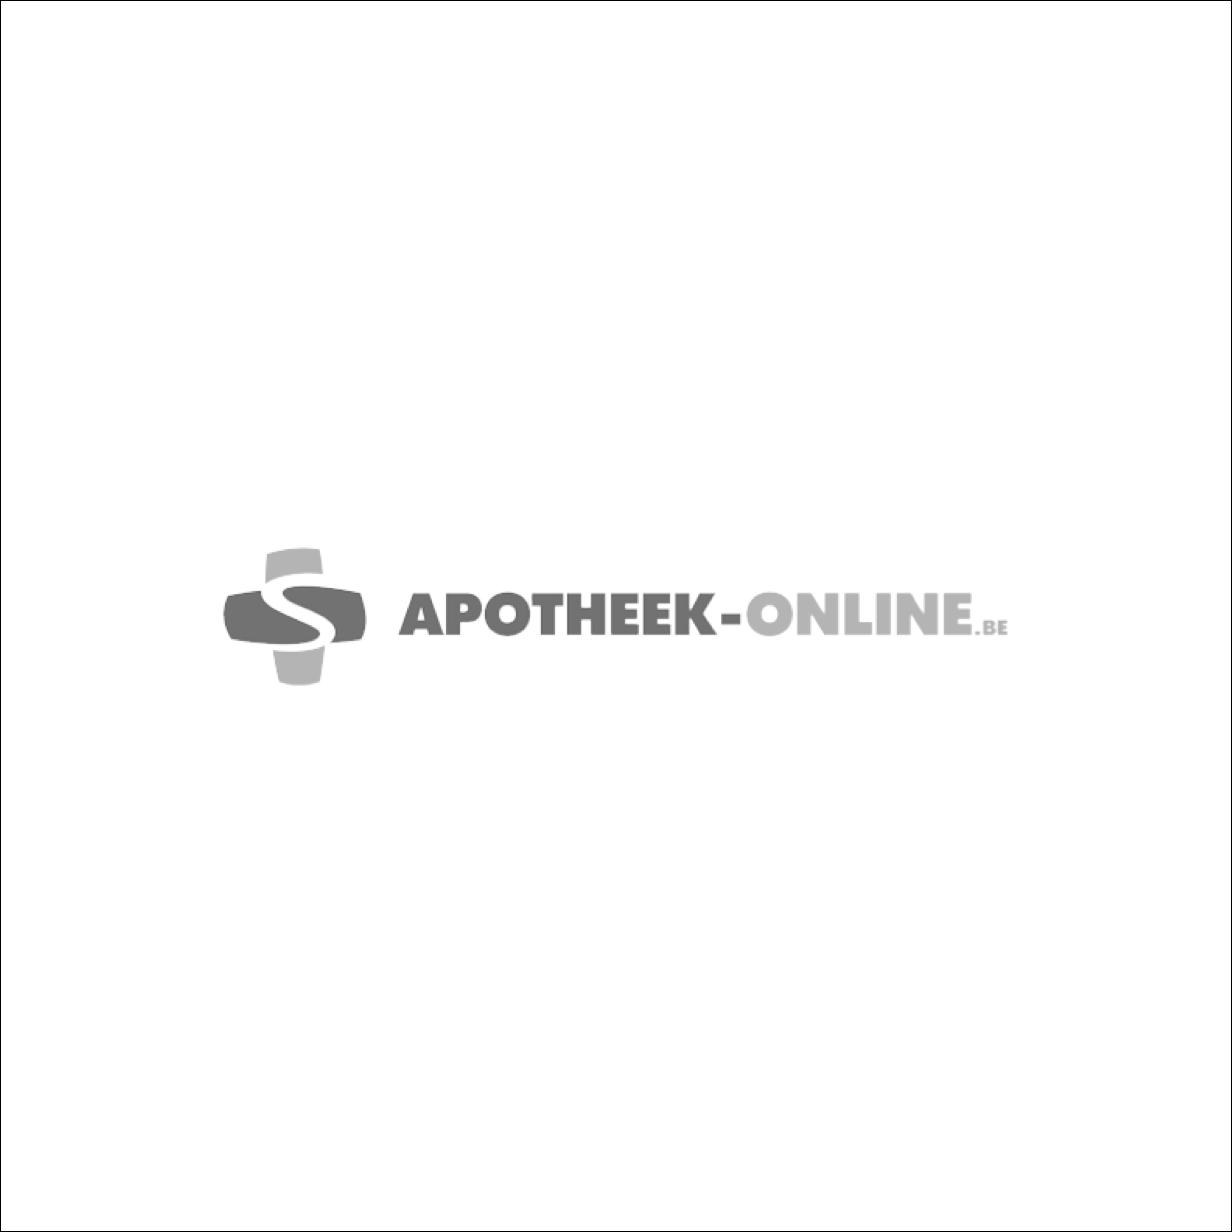 Puressentiel Promopack Slaap Ontspanning Luchtspray + Ademhaling Bad/Douche